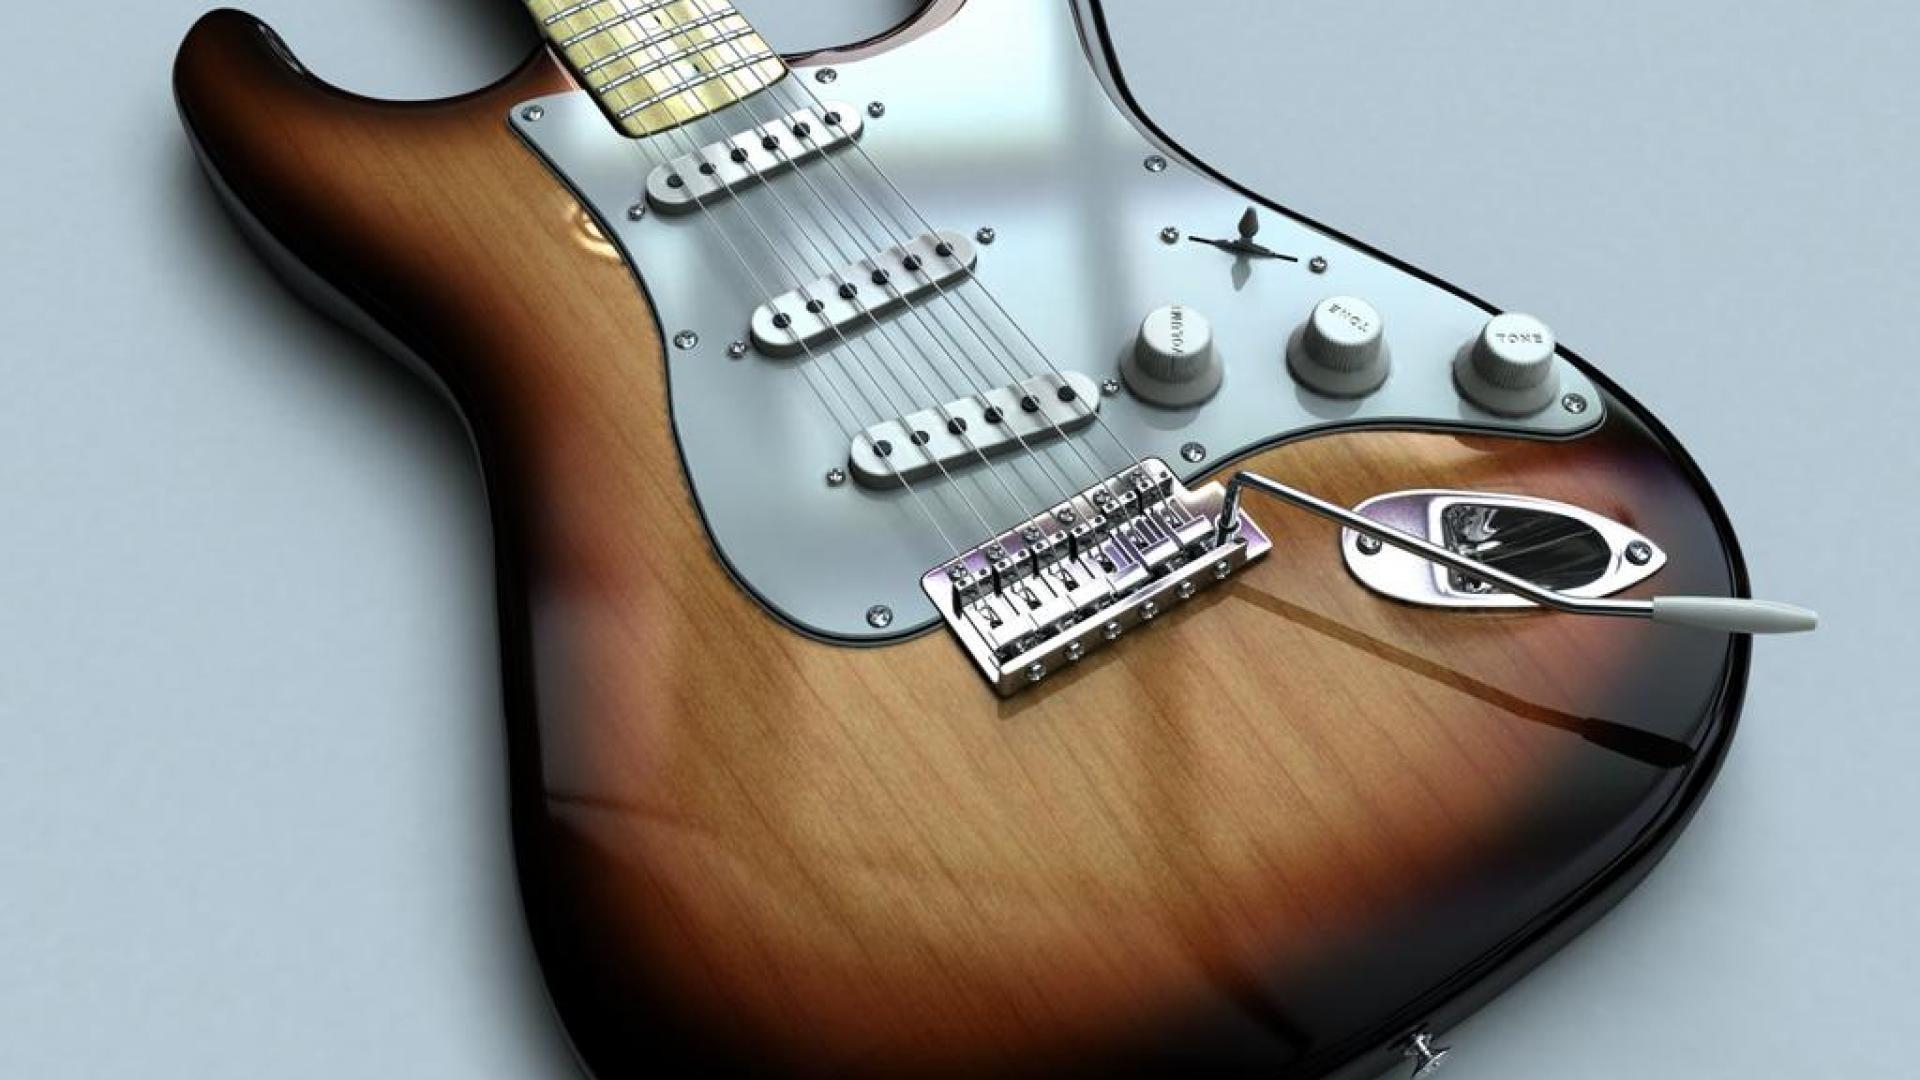 WallpaperSafari Fender Stratocaster wallpaper - Free Desktop HD iPad iPhone .